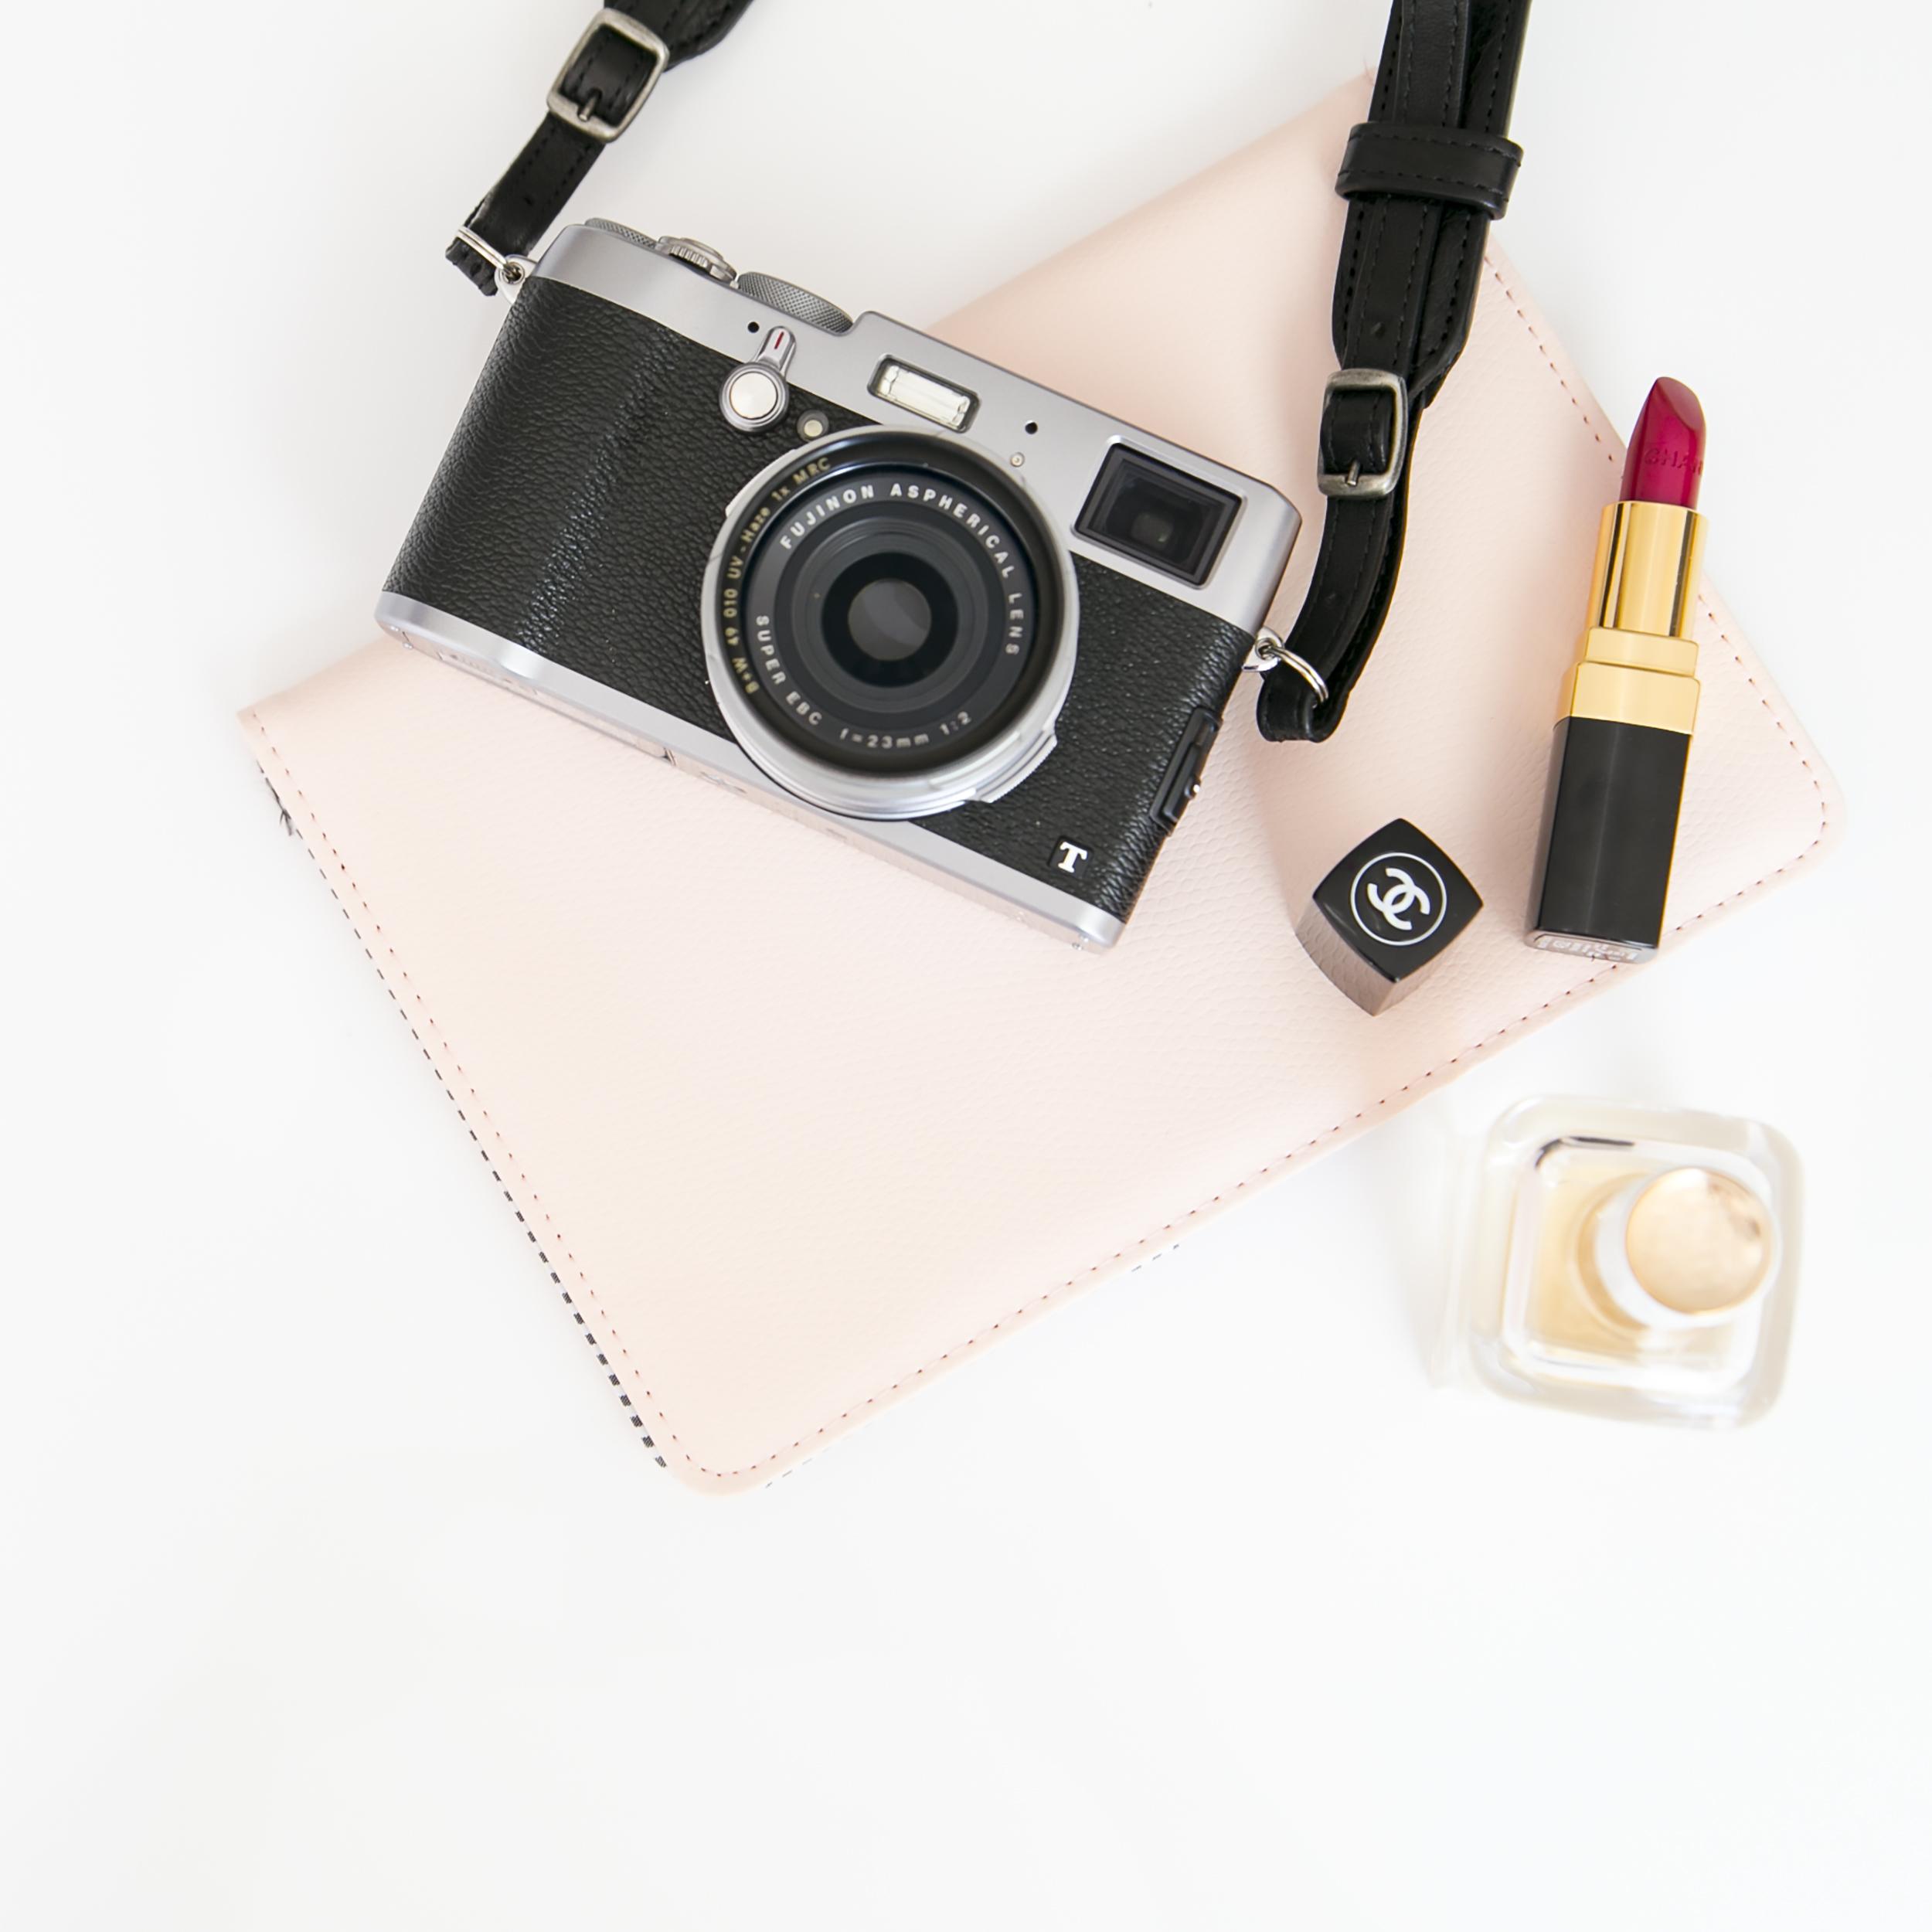 Maison Pazi, der Mamablog aus Nürnberg, Momblog Nürnberg, beste Mamablogs, schönste Mamablogs, Stillen, Tragen, Familienbett, bedürfnisorientiert